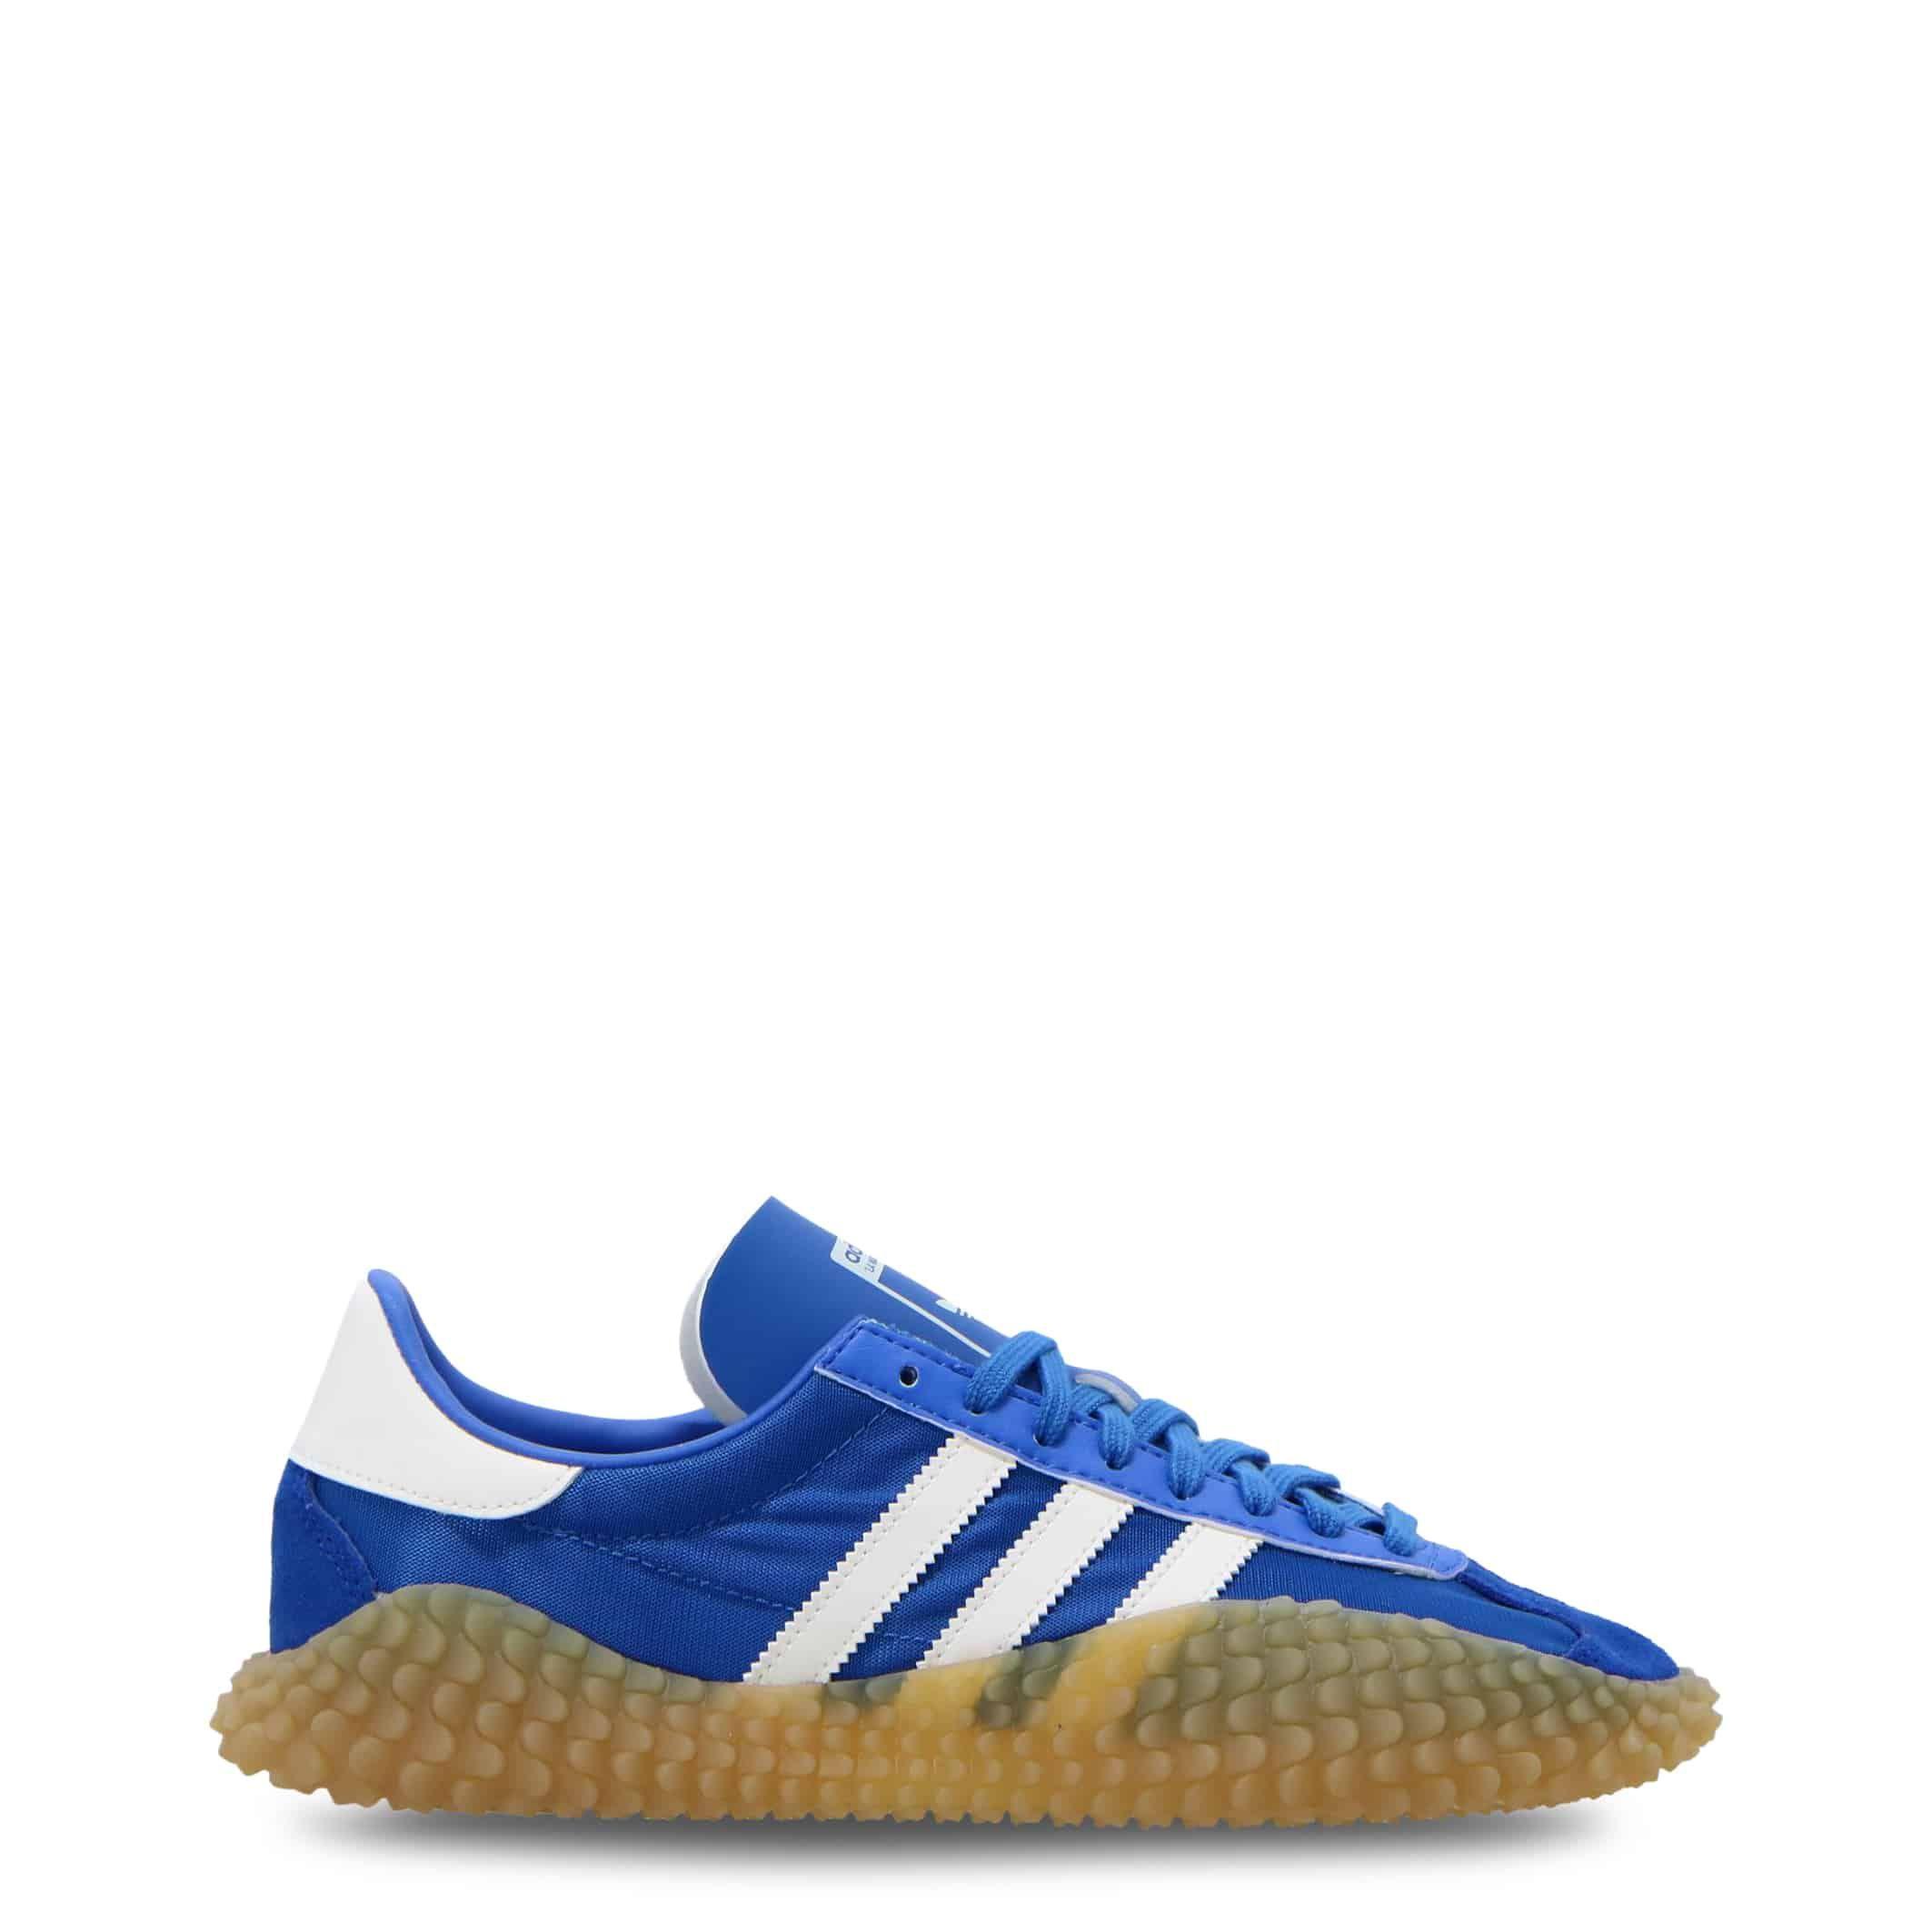 Adidas – CountryxKamanda – Blu